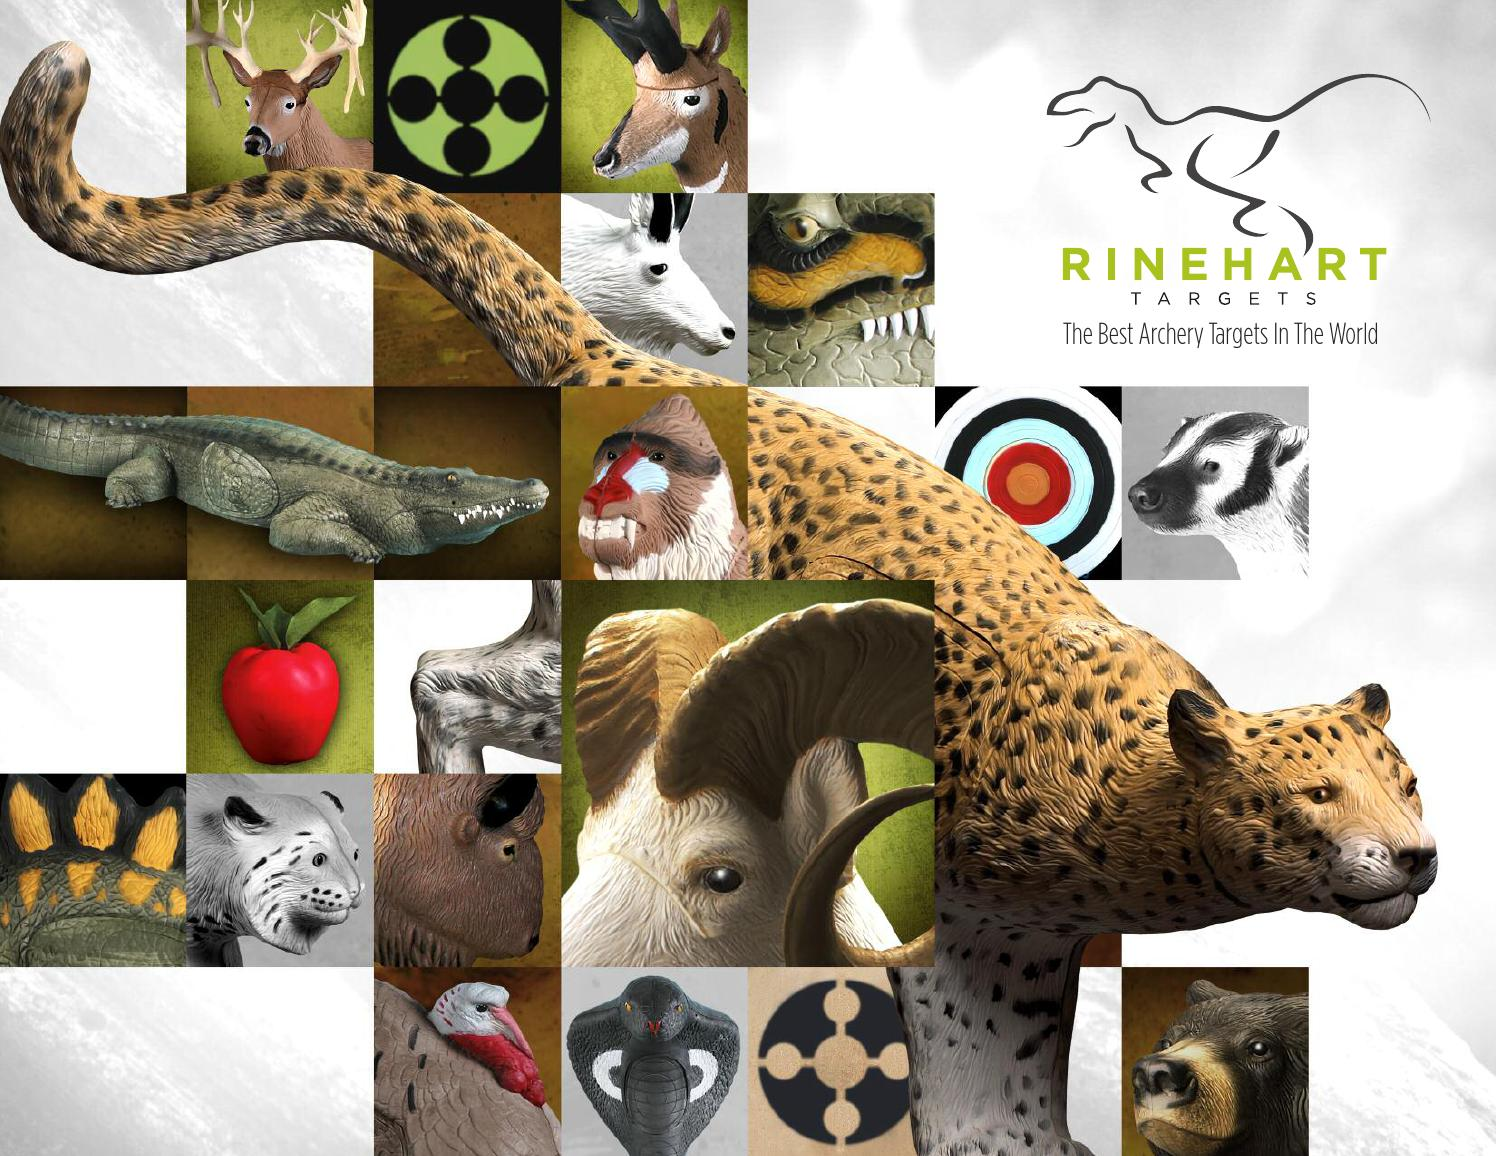 NEW Rinehart Targets 450 Red Fox Self Healing Predator Archery Hunting Target